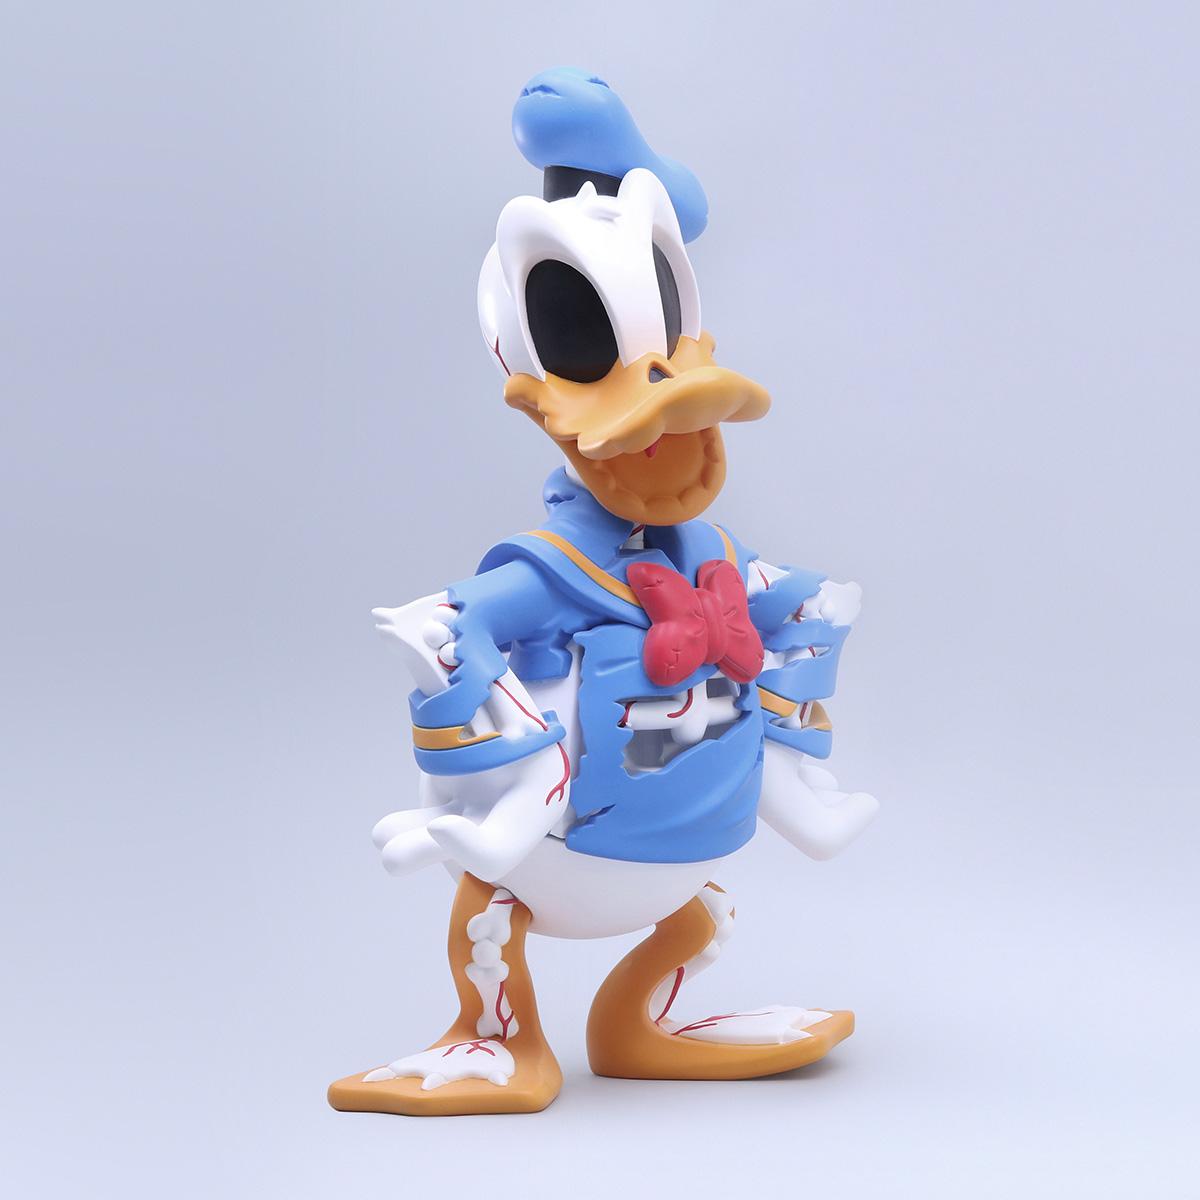 Cote Escriva Creepy Duck Thunder Mates Art Toy